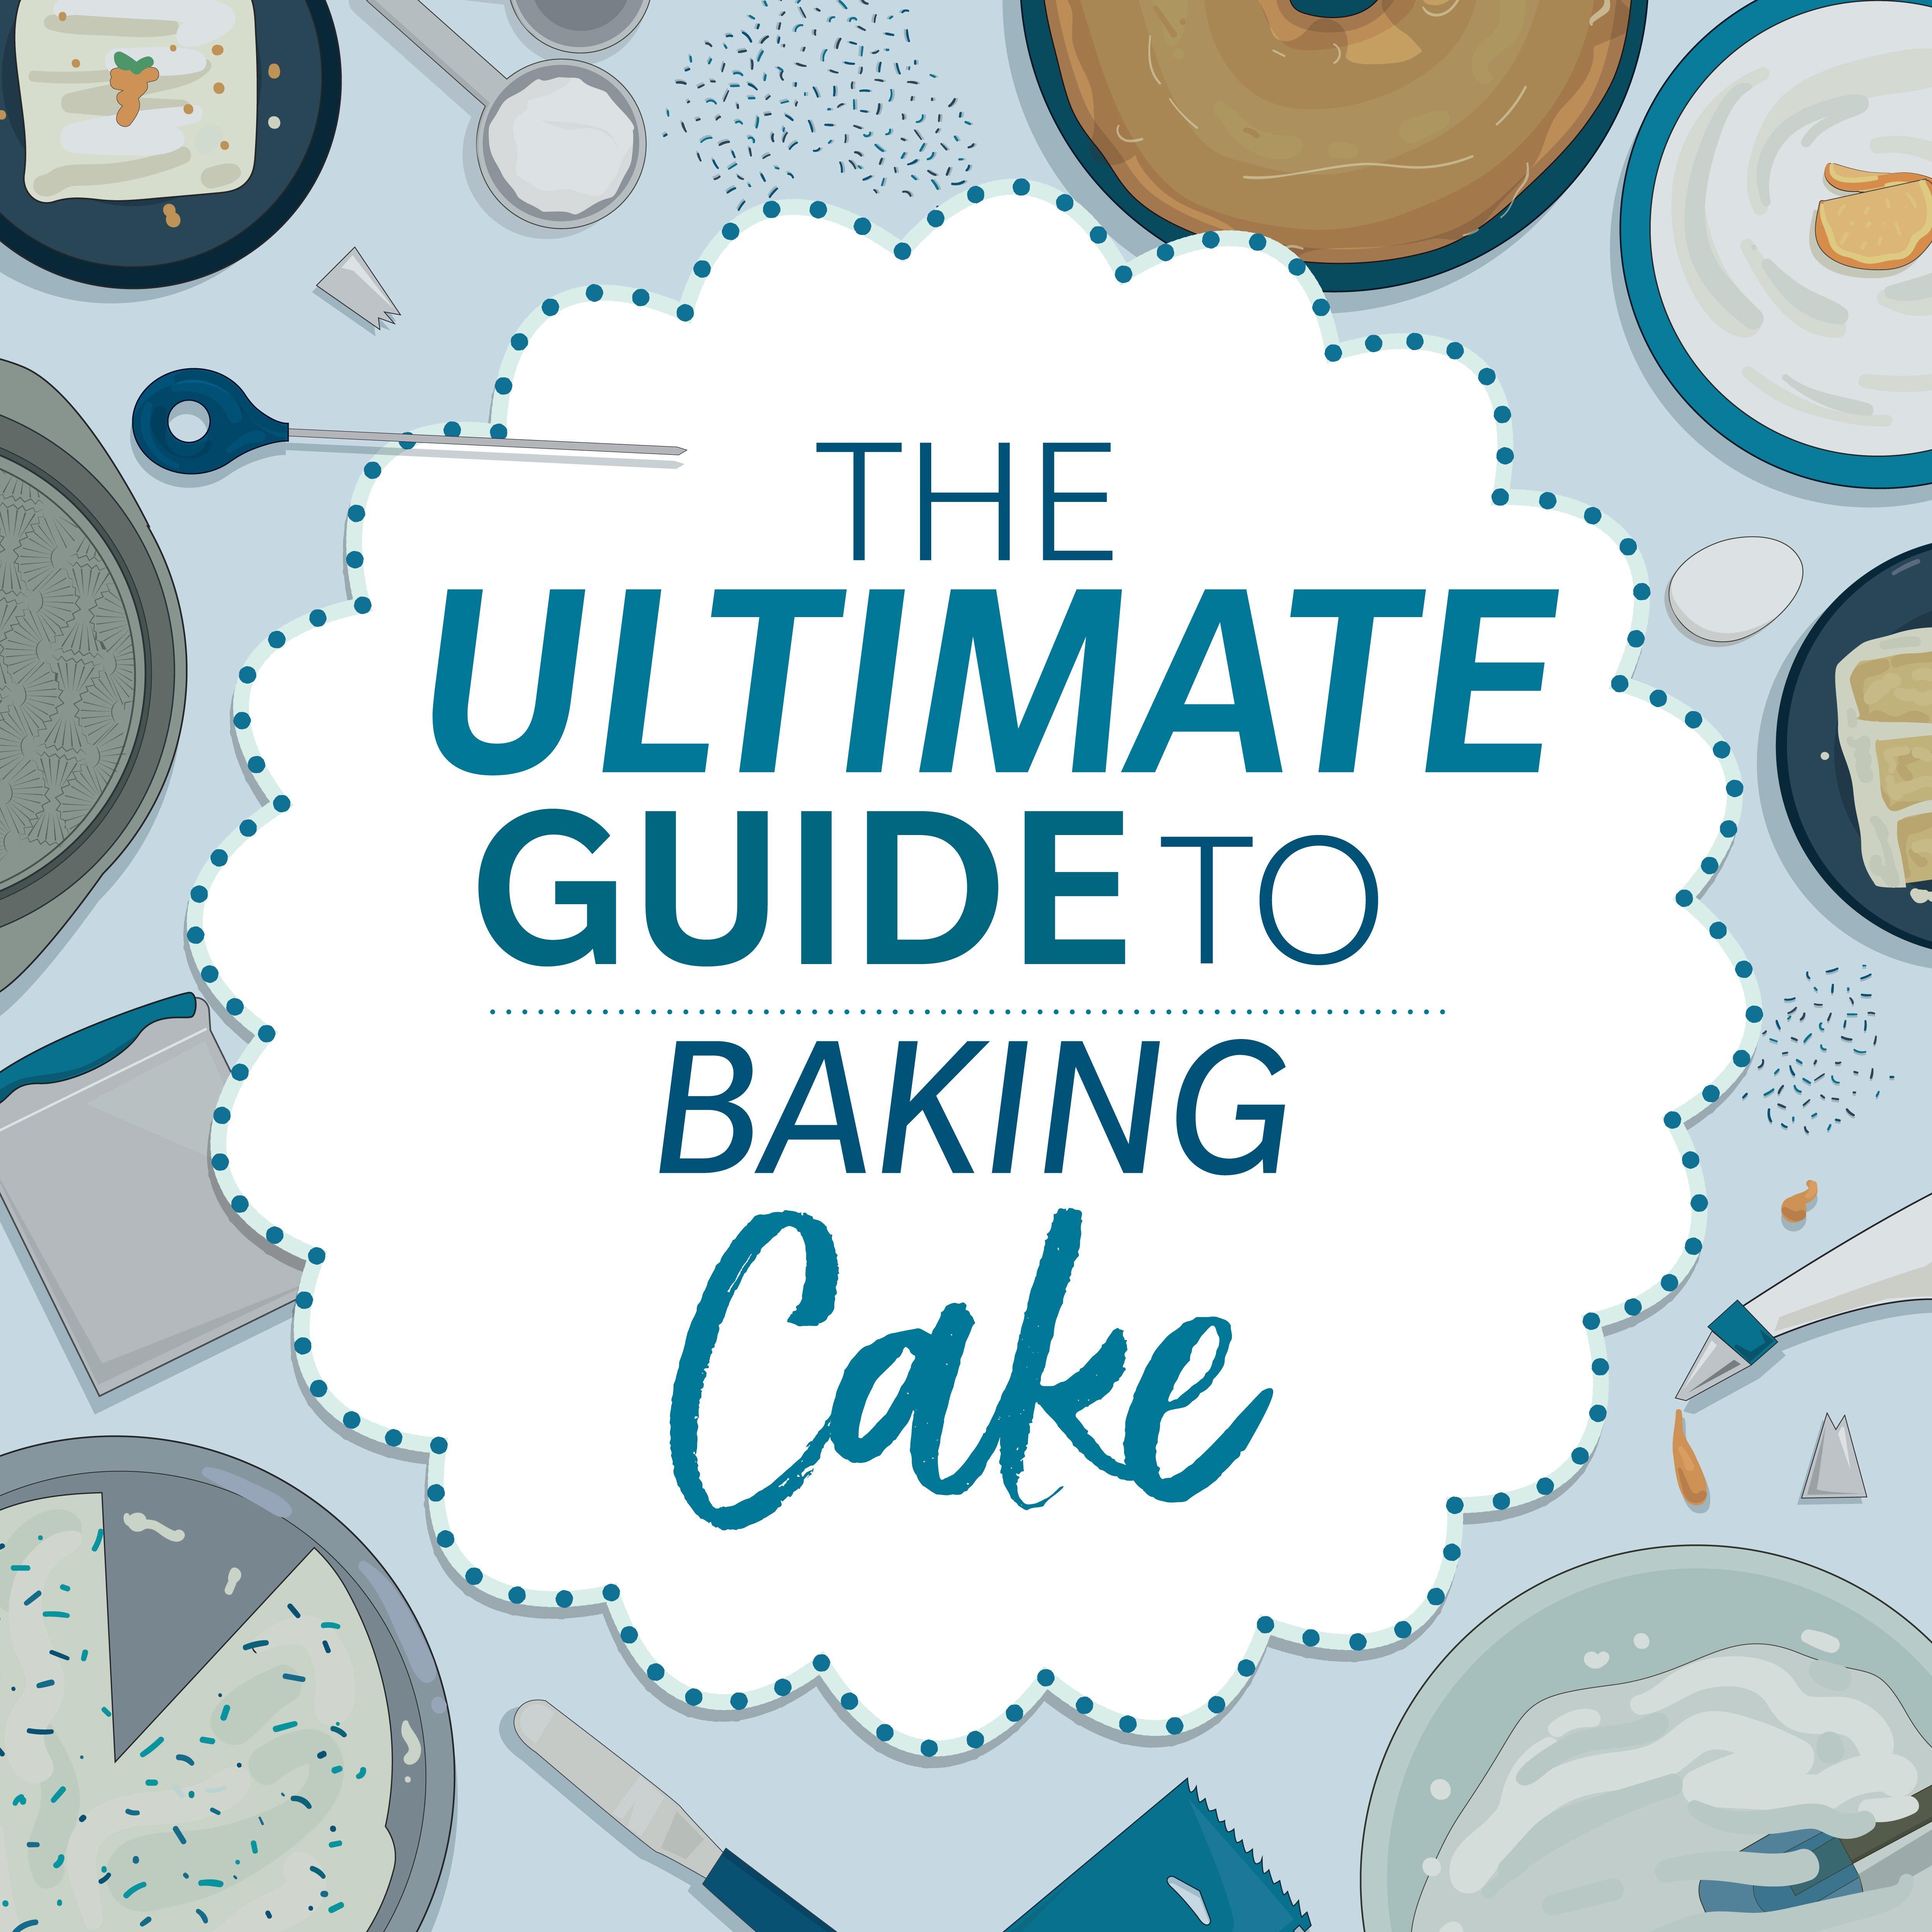 bakeable cake supplies on blue background illustration